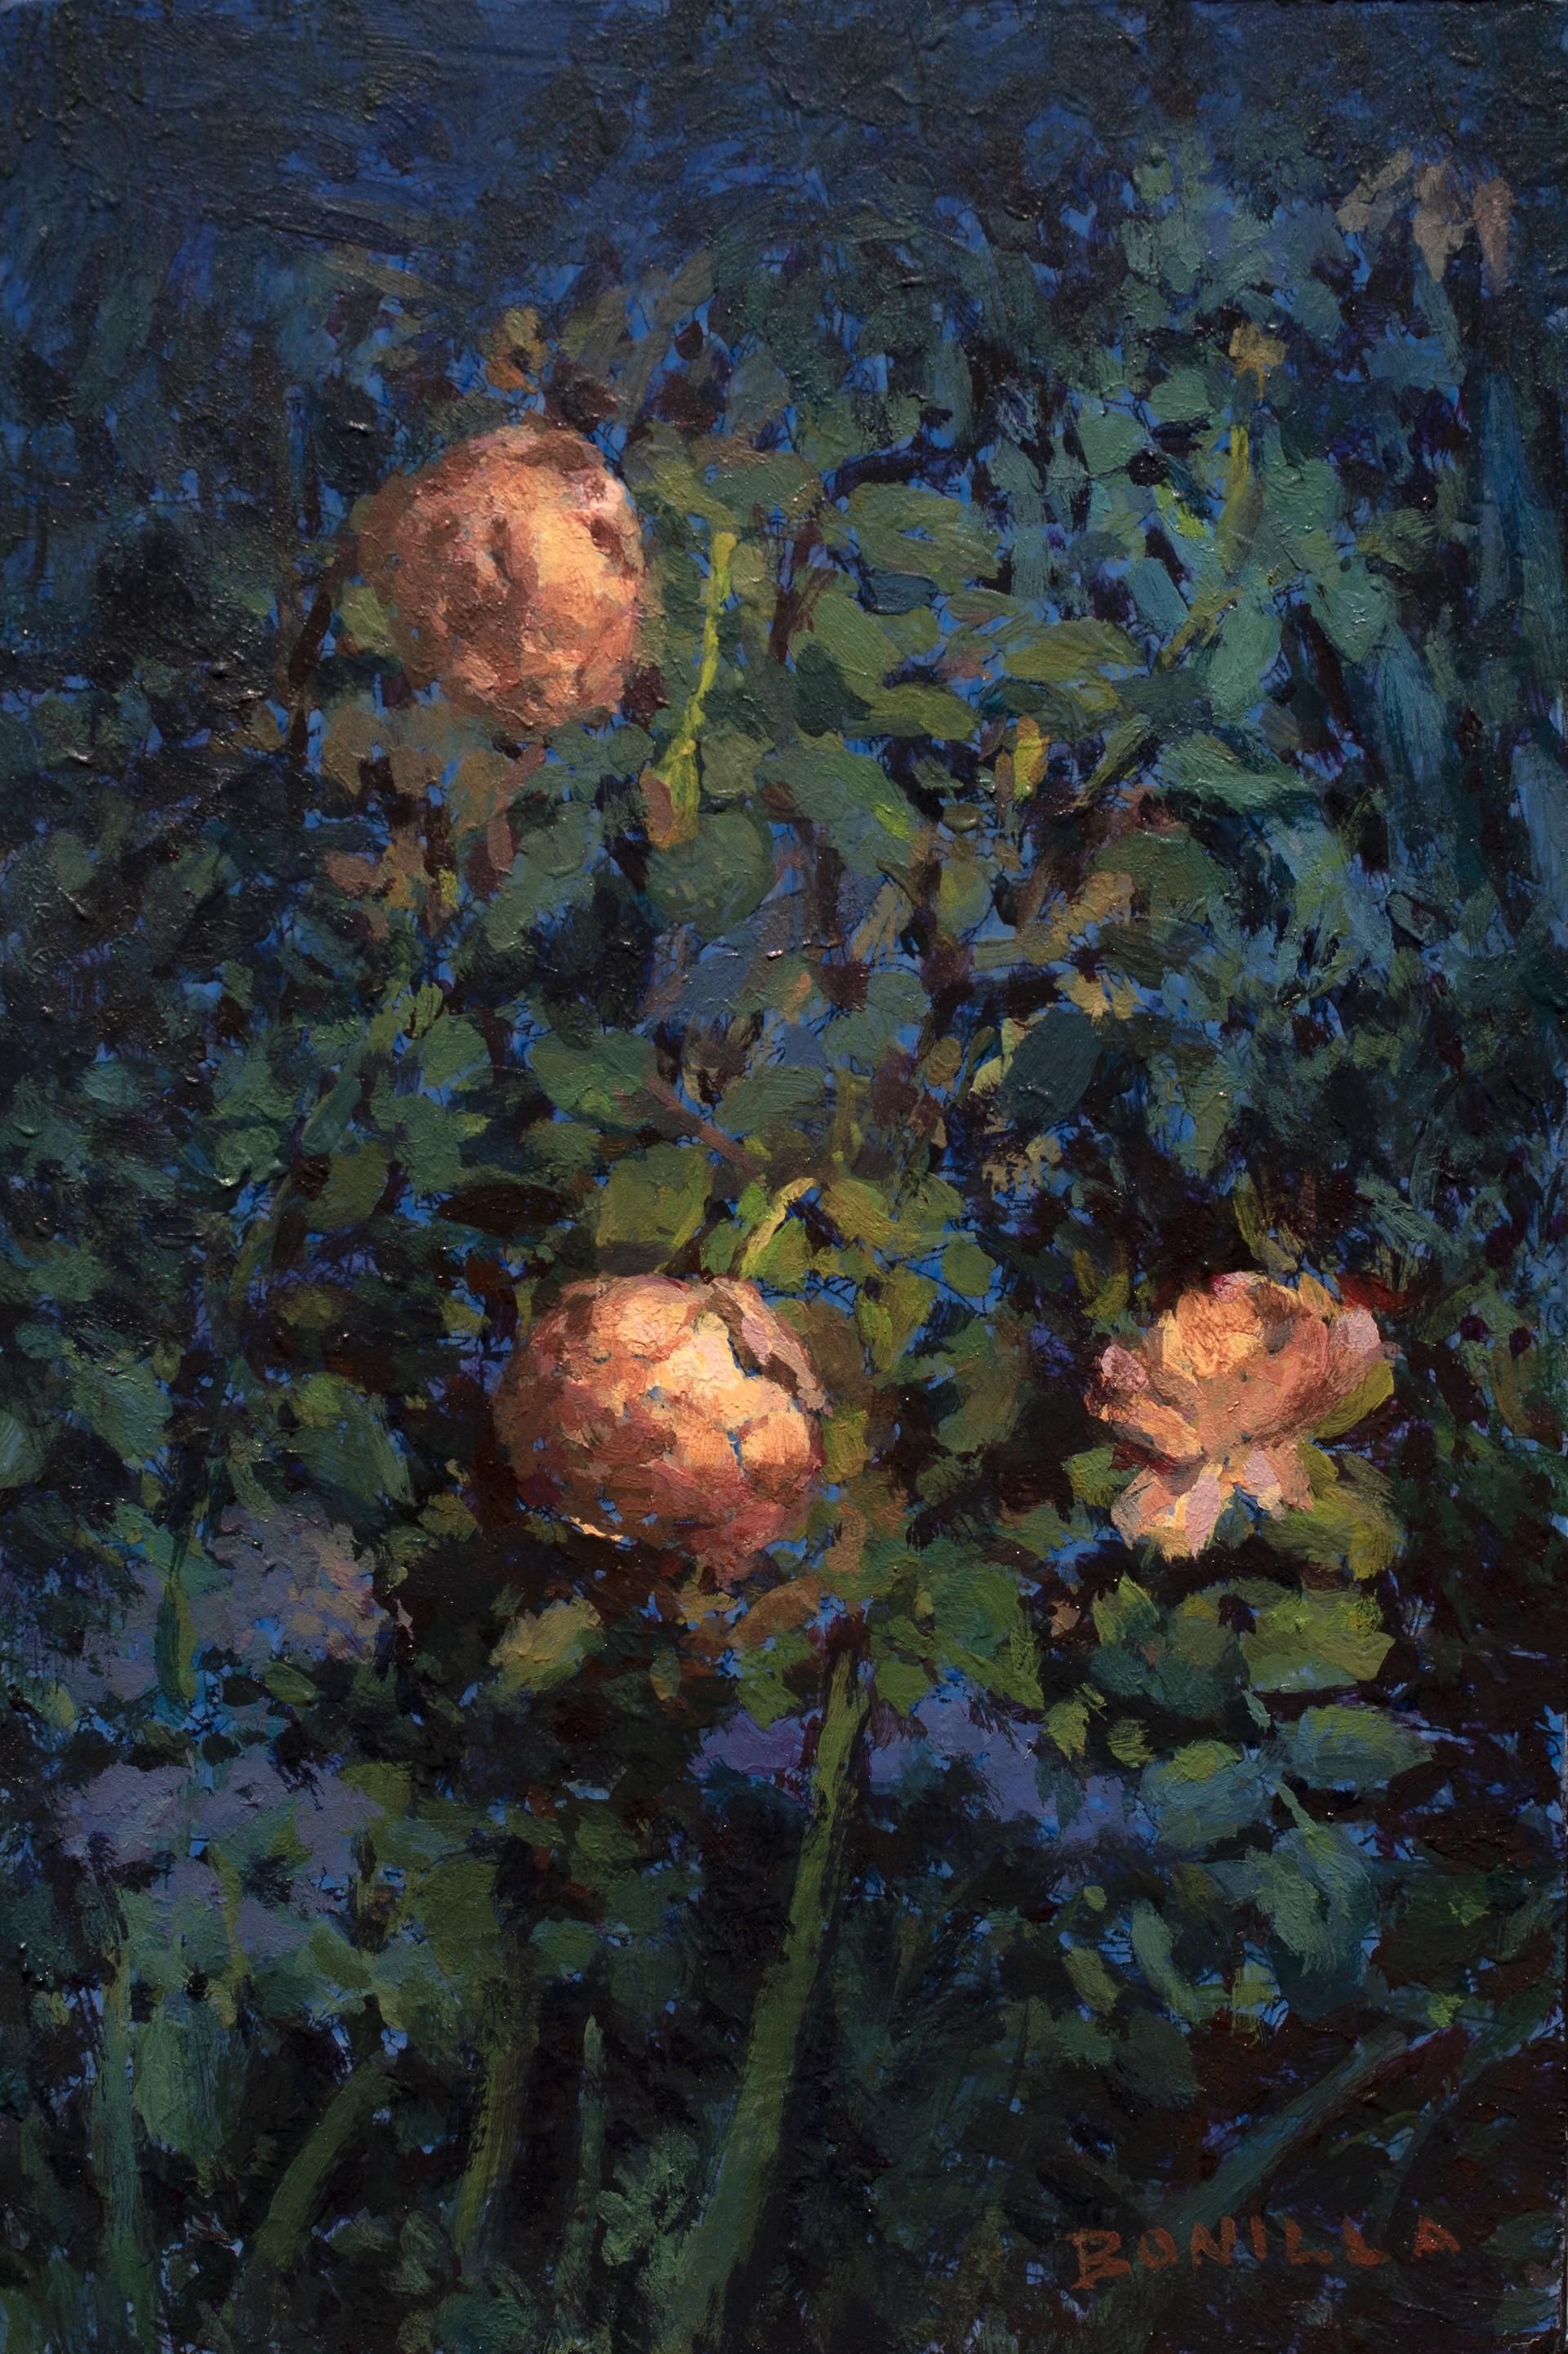 Study for Jude by Raymond Bonilla